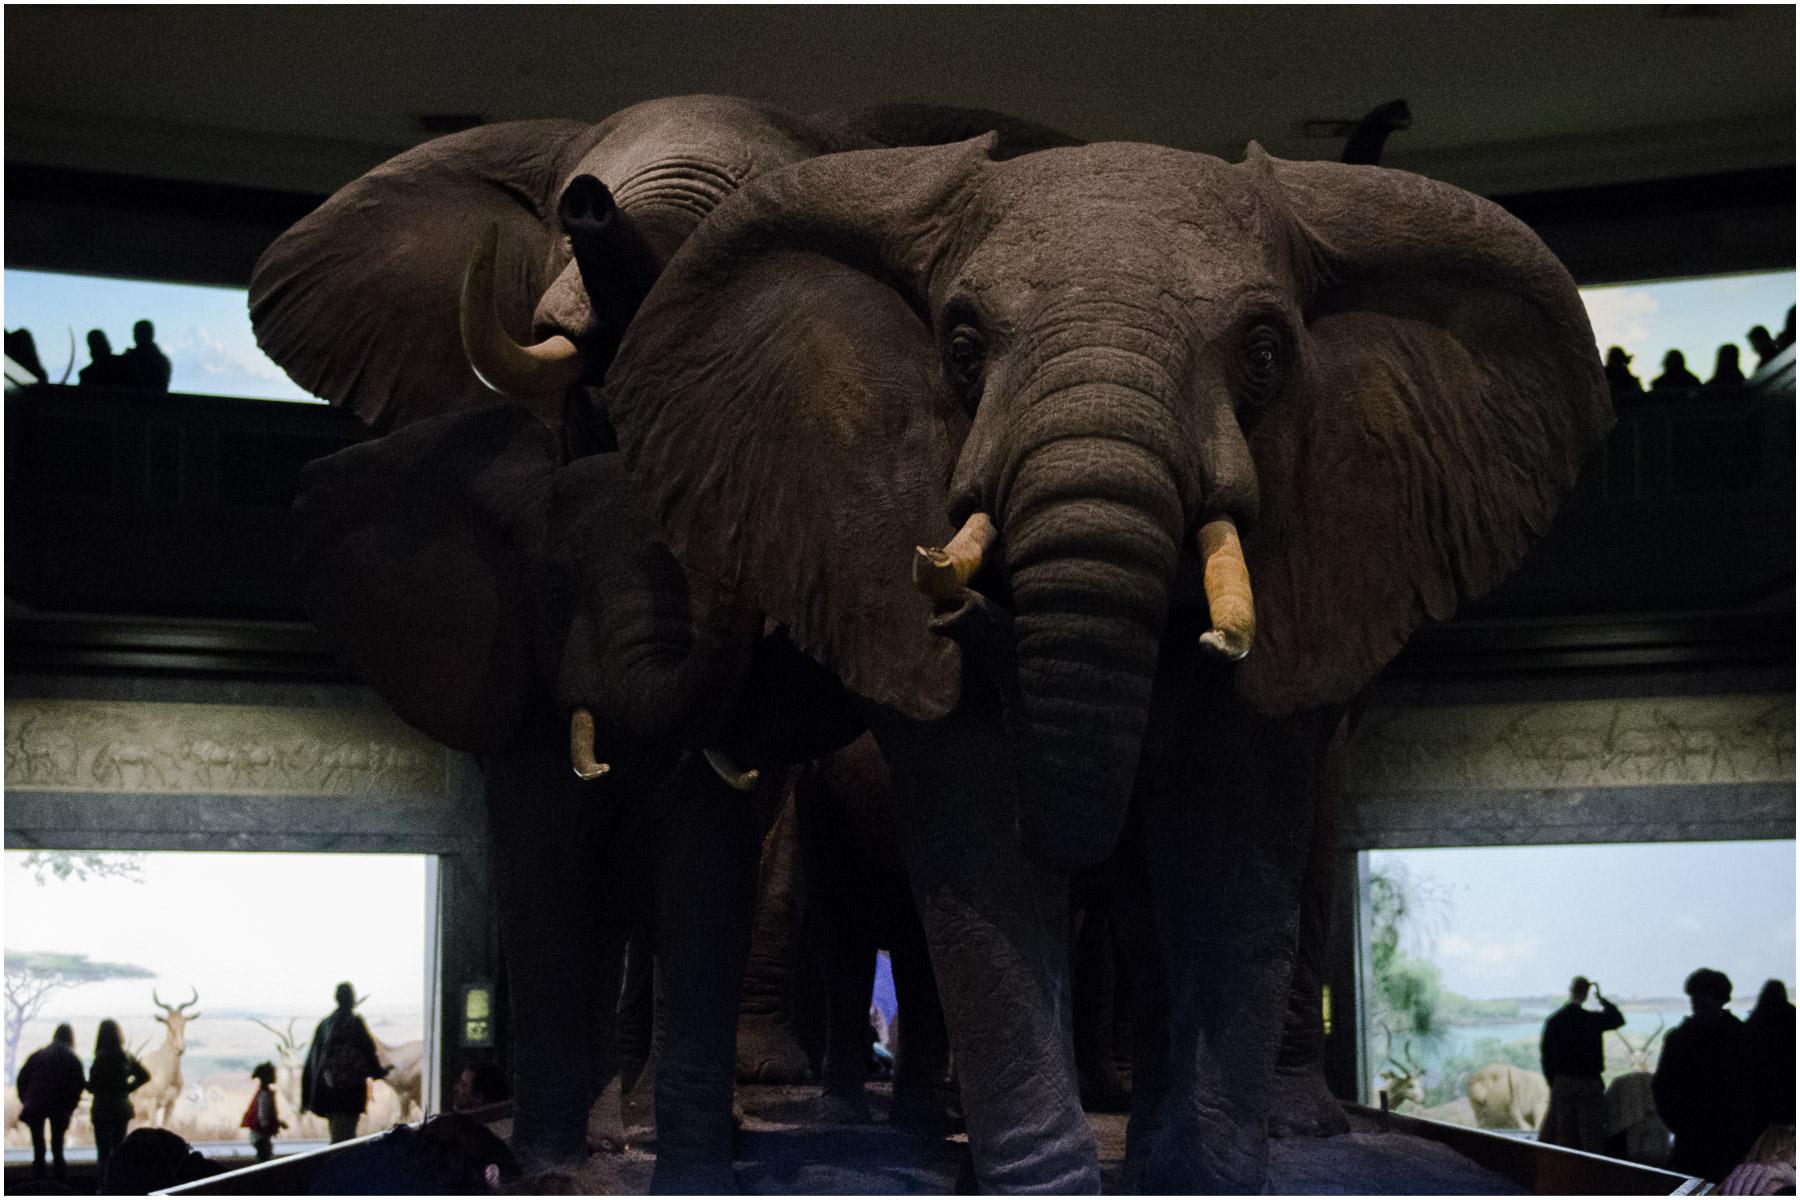 American-Museum-of-Natural-History_8.jpg